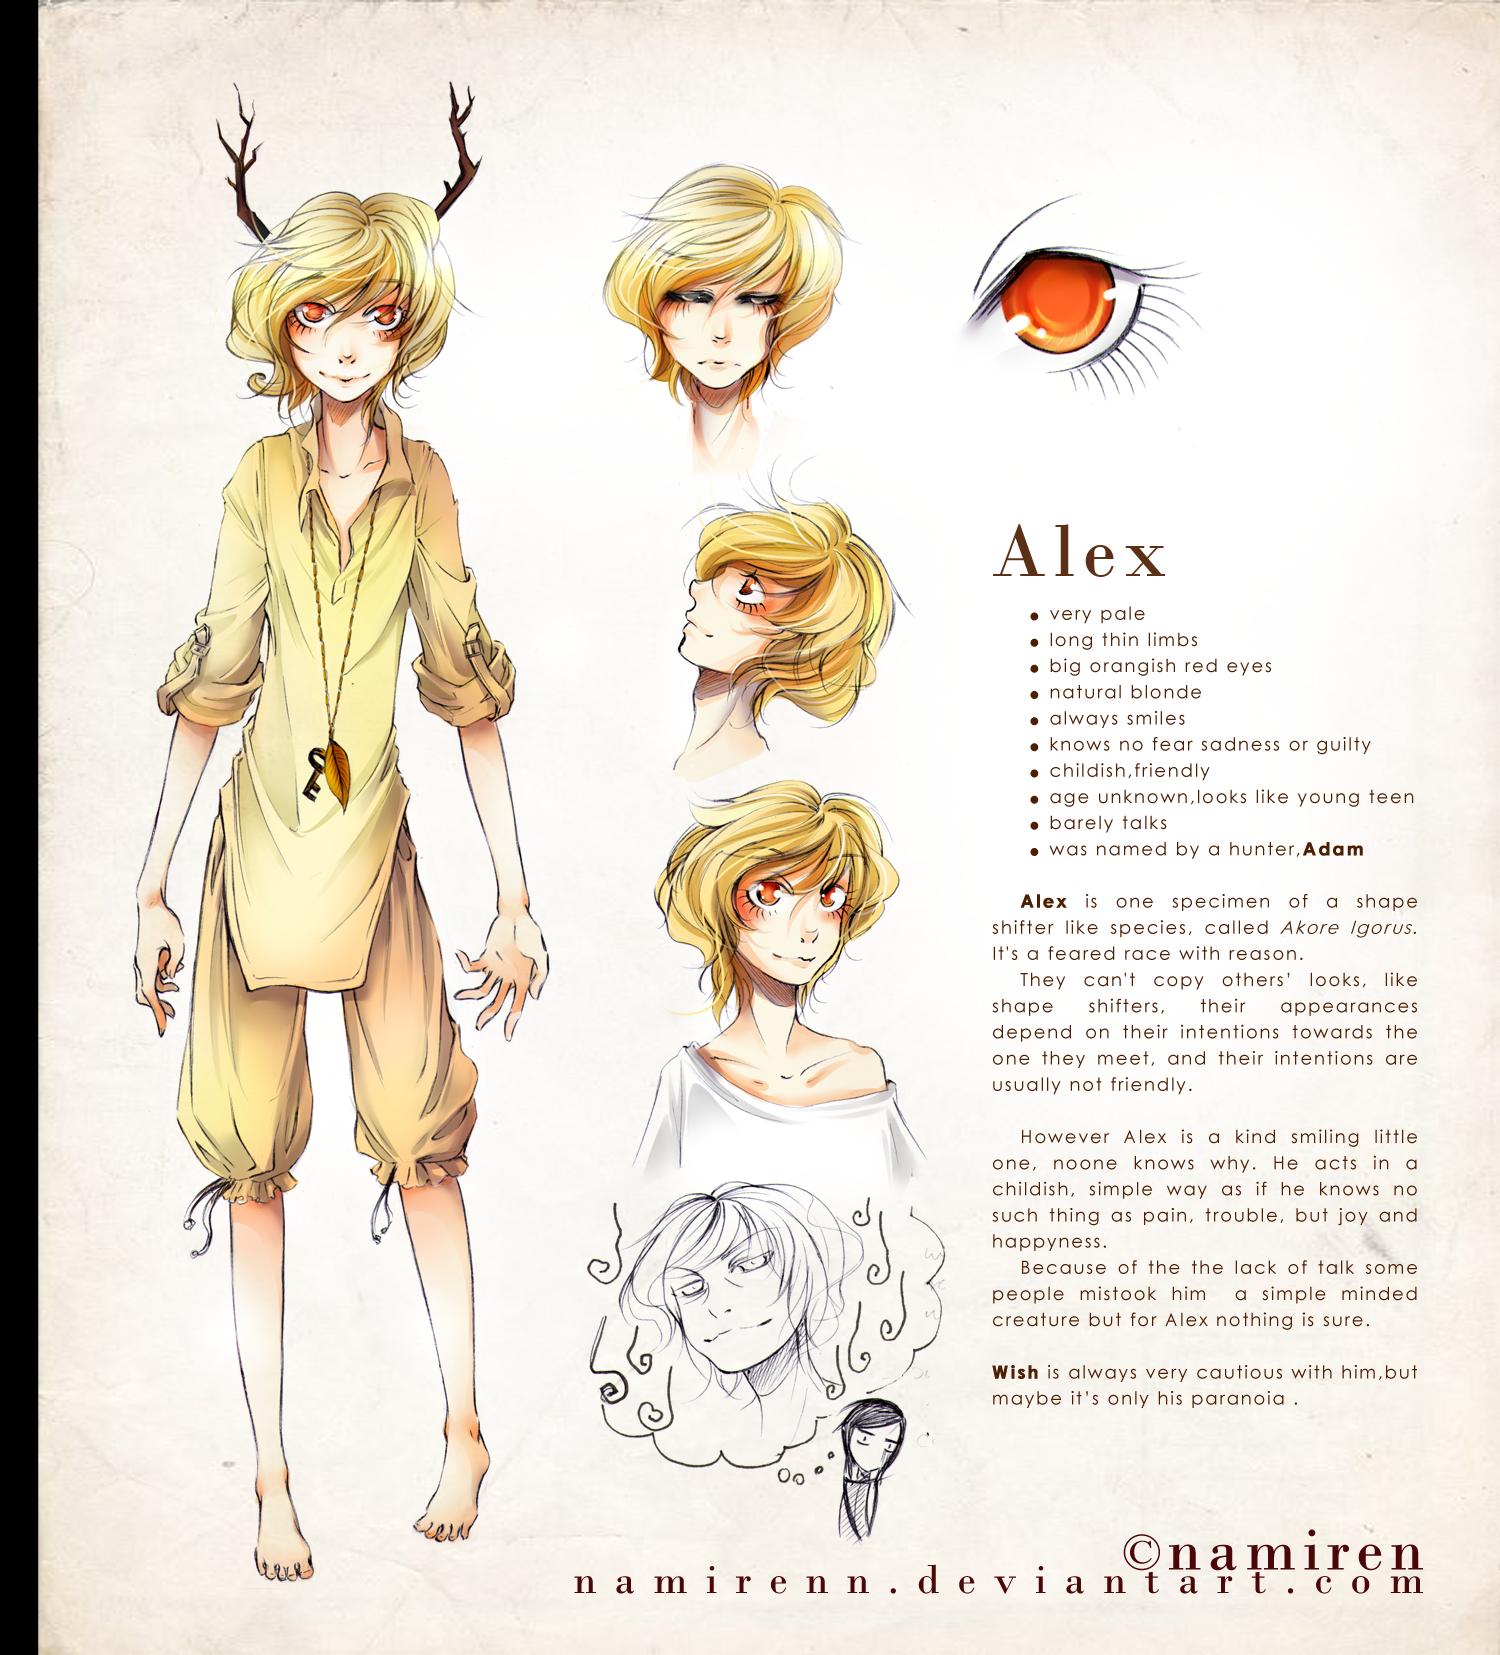 Character information sheet -  Alex Character Sheet By Namirenn